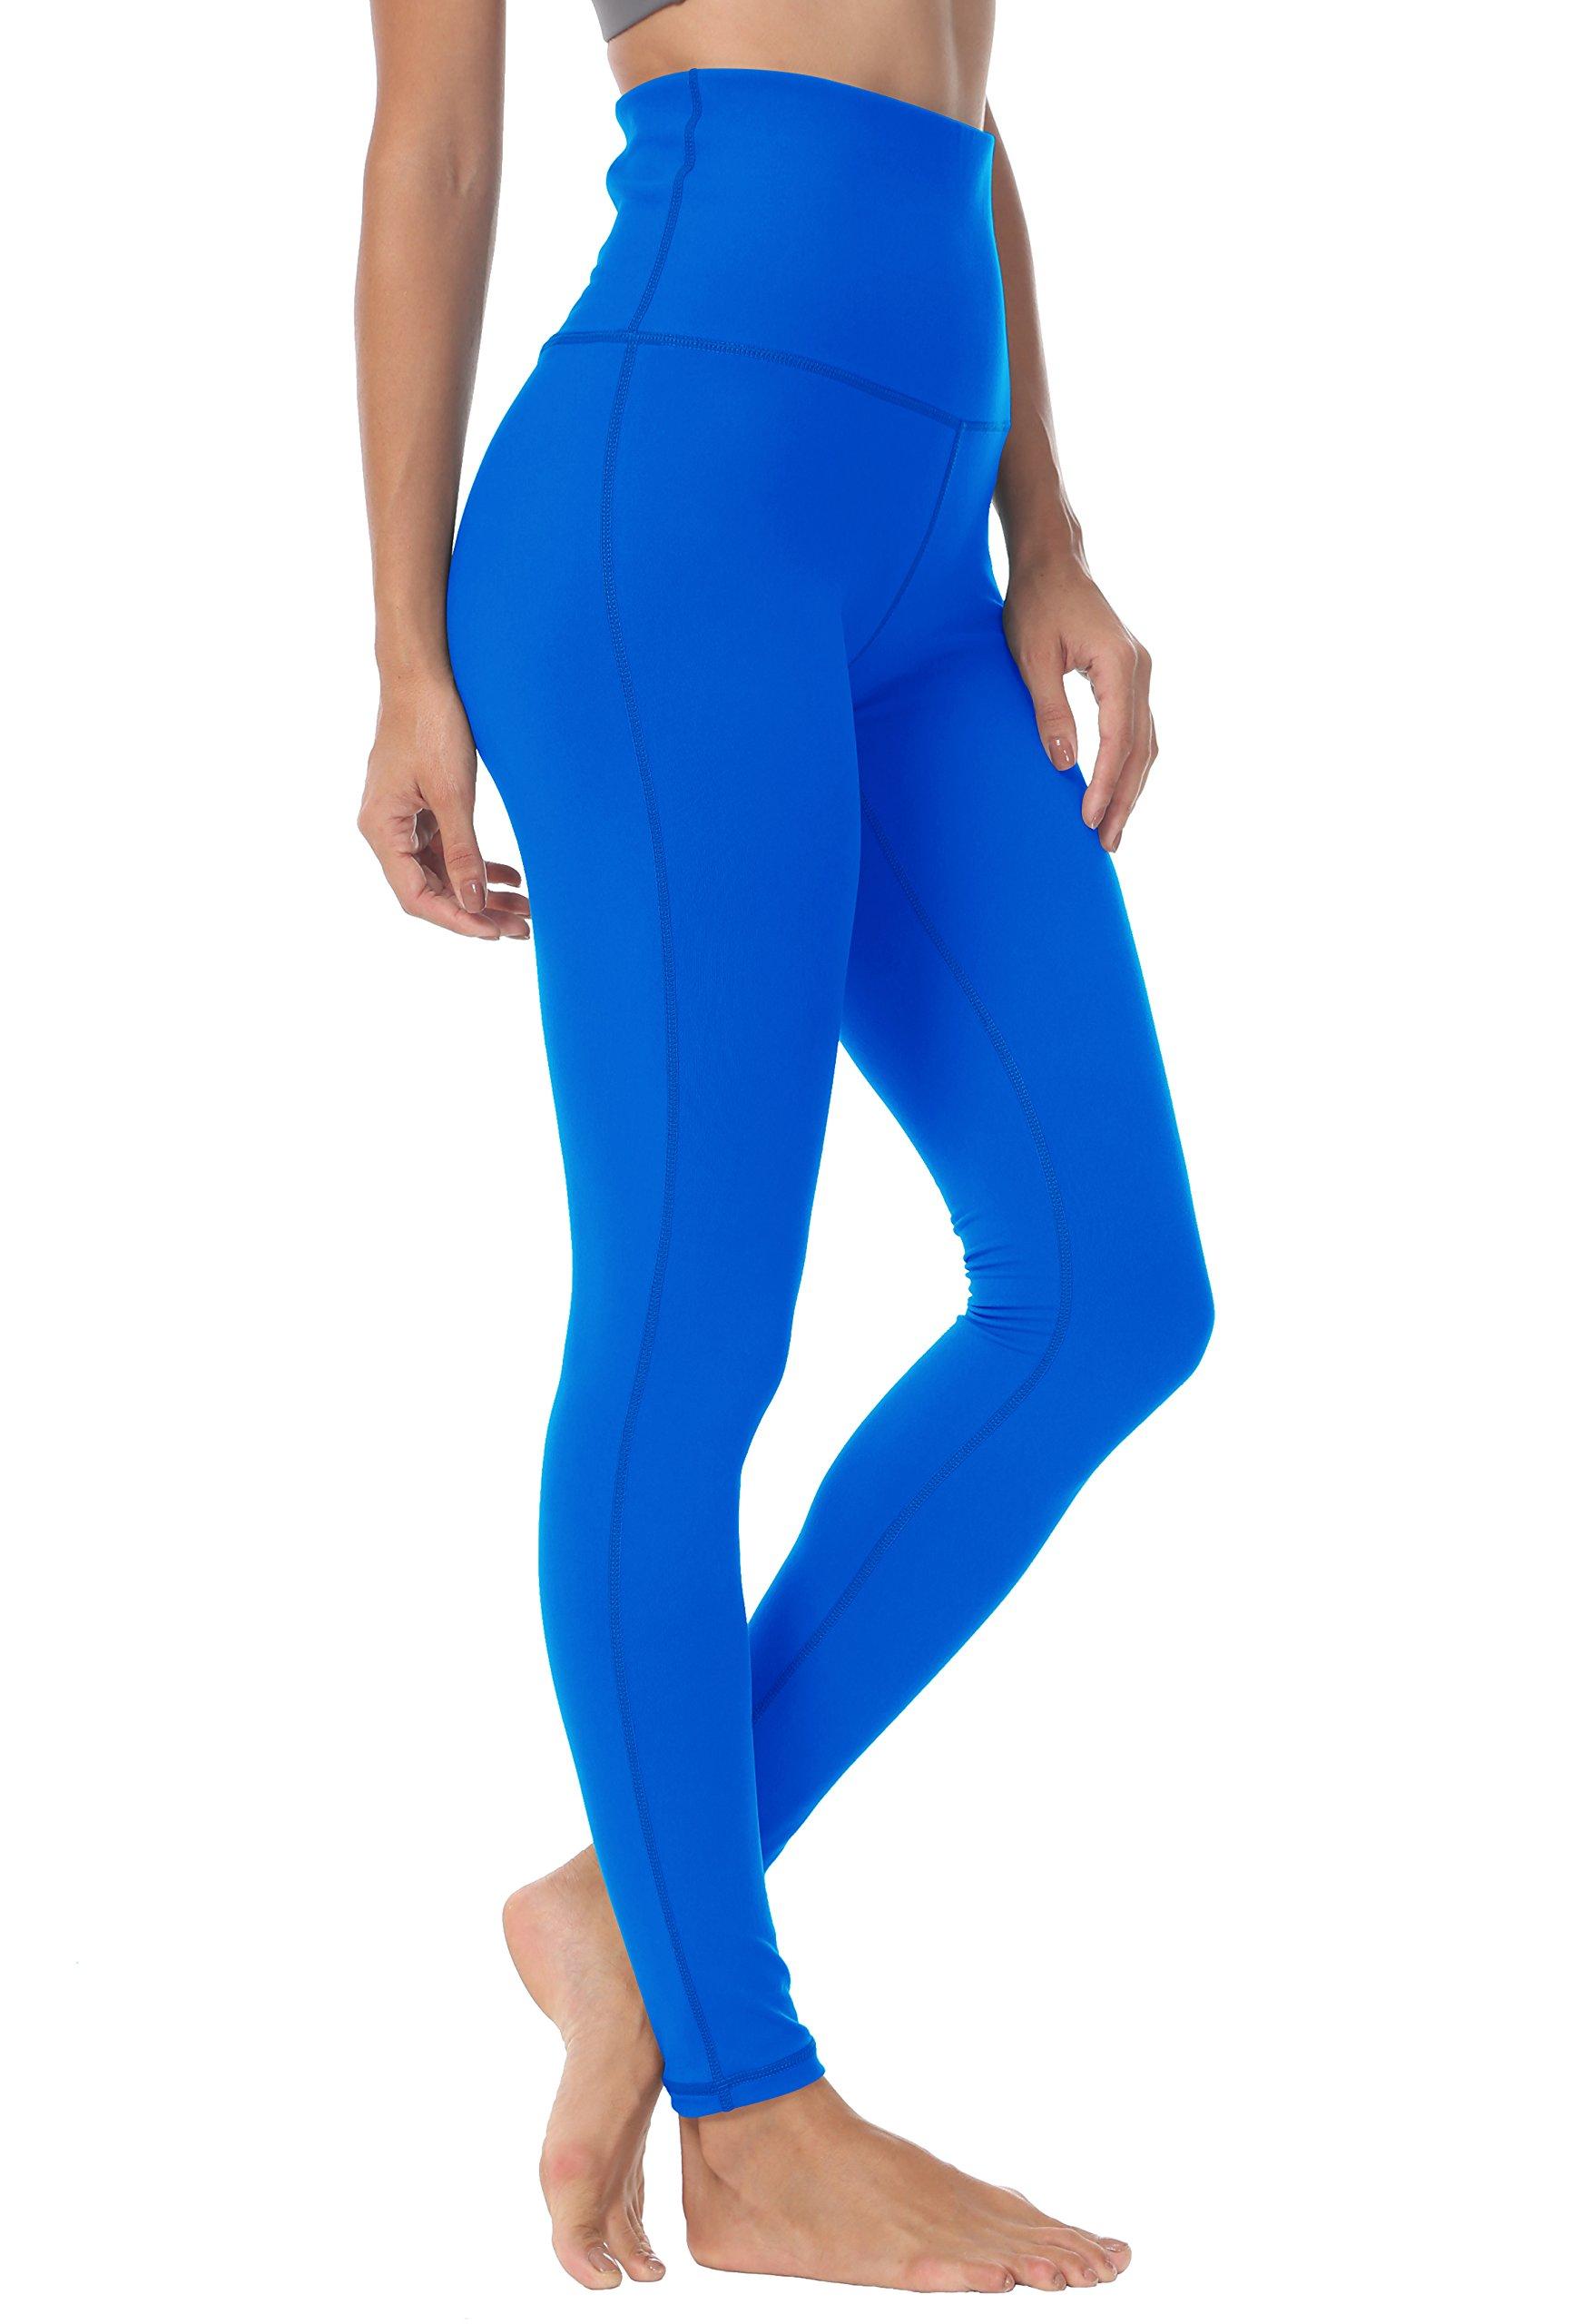 53f3dade4af37 QUEENIEKE Women Yoga Legging Power Flex High Waist Running Pants Workout  Tights product image